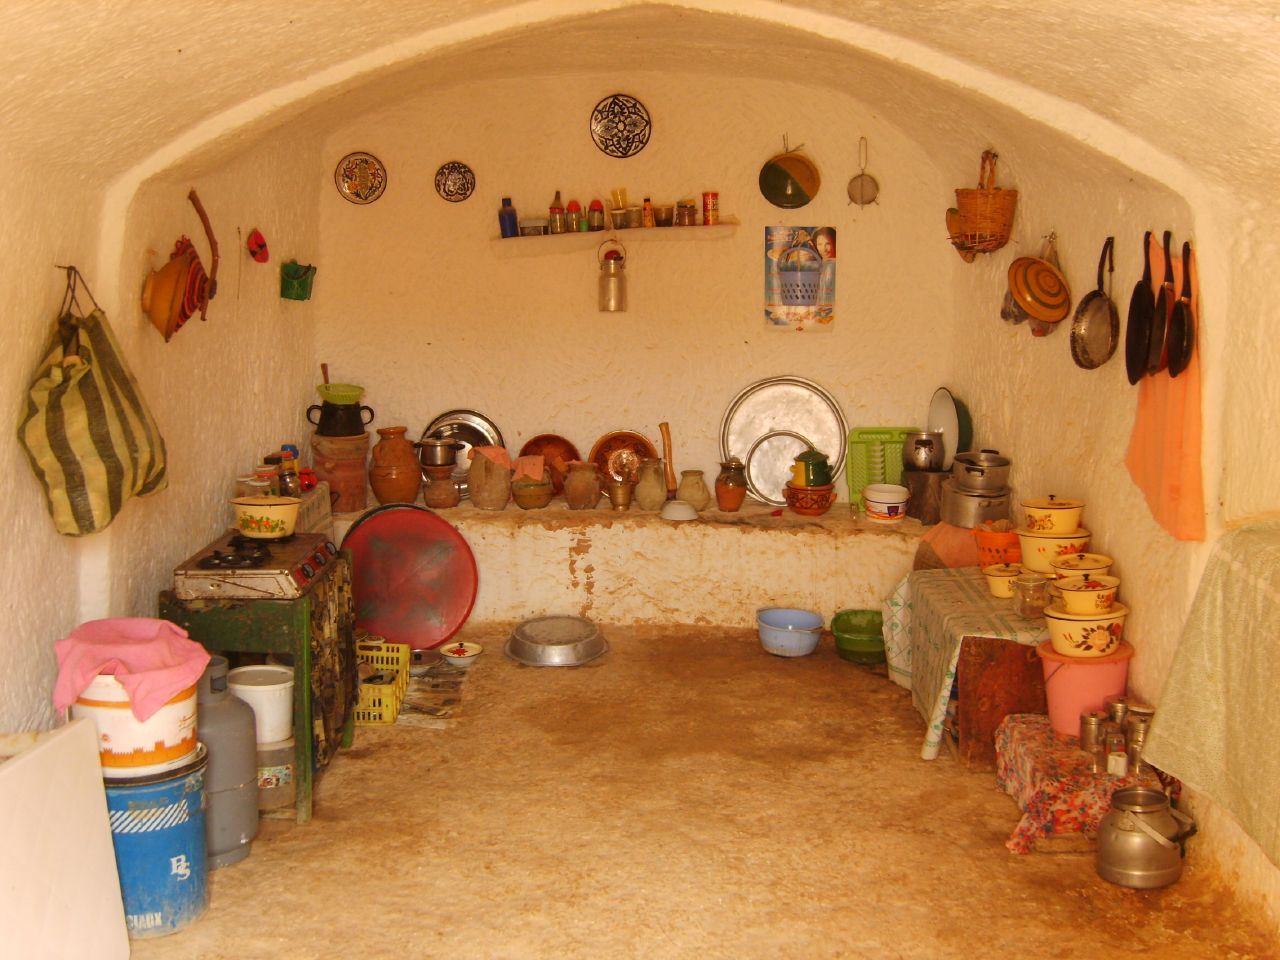 fichiermatmata berber kitchenjpg � wikip233dia